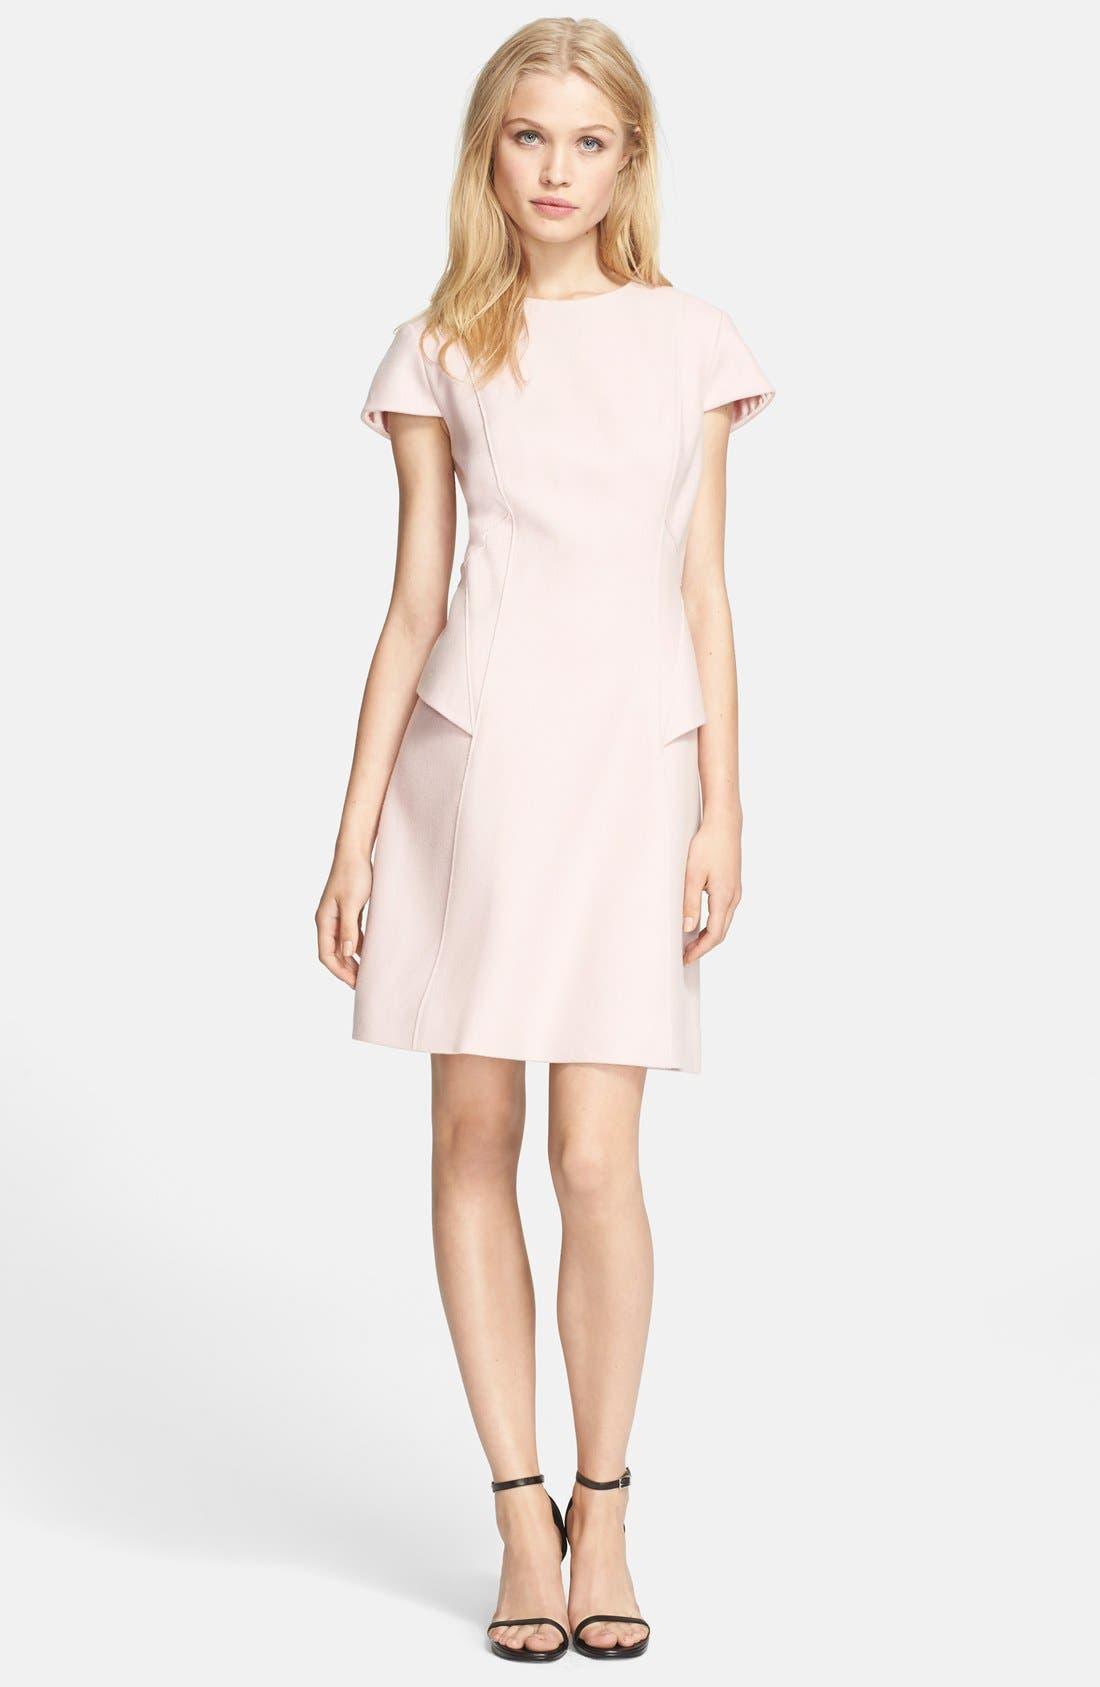 Alternate Image 1 Selected - Ted Baker London 'Coralen' Structured Wool Blend Sheath Dress